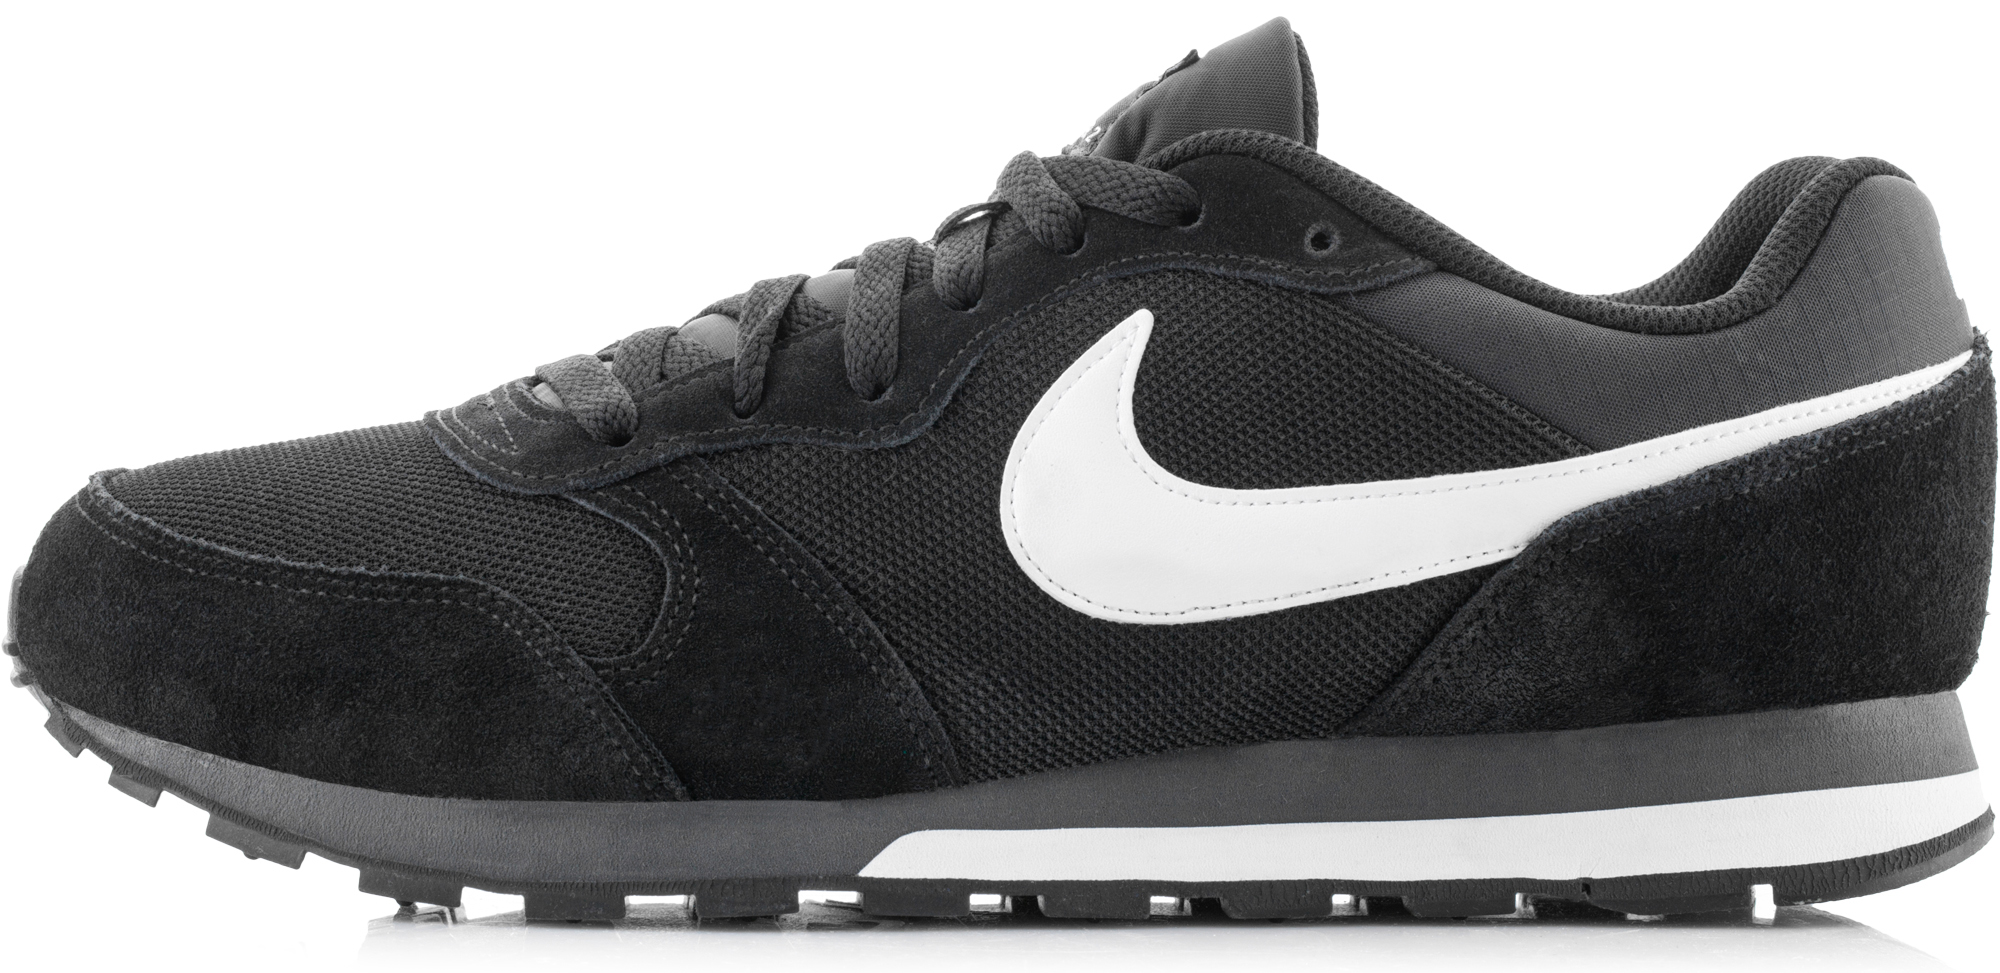 Nike Кроссовки мужские Nike MD Runner 2 кроссовки nike кроссовки nike md runner 2